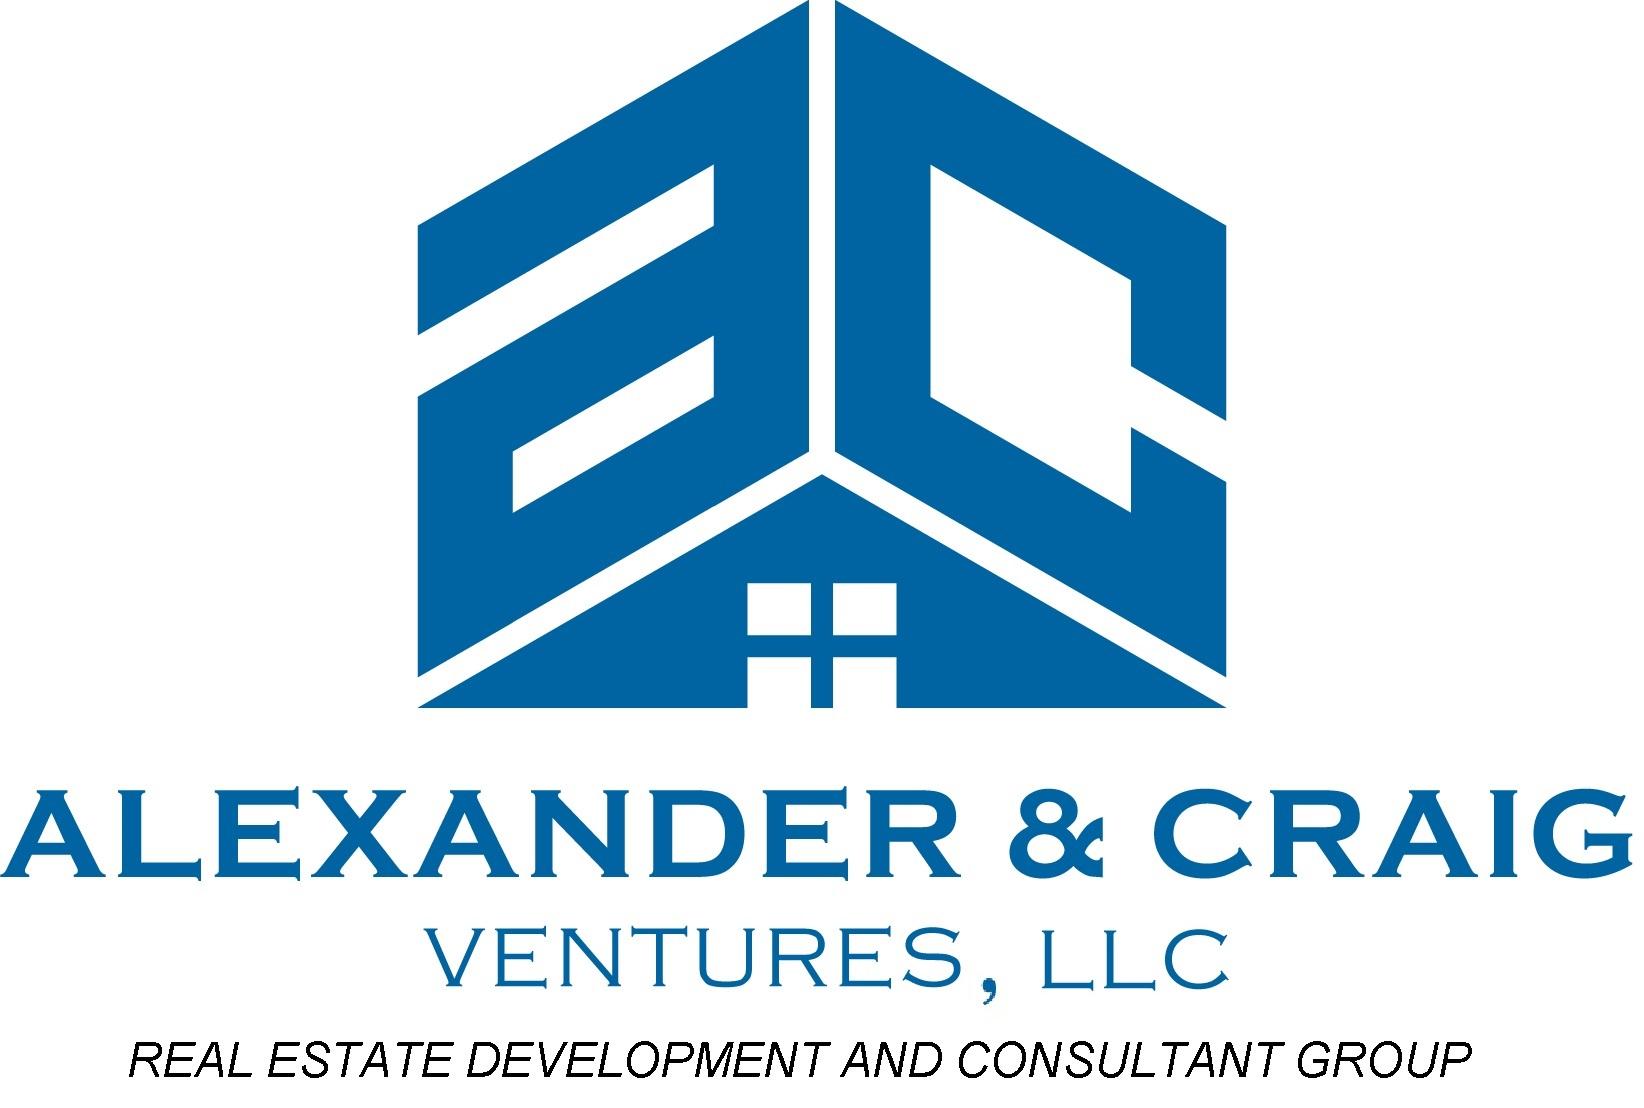 Alexander & Craig Ventures, LLC